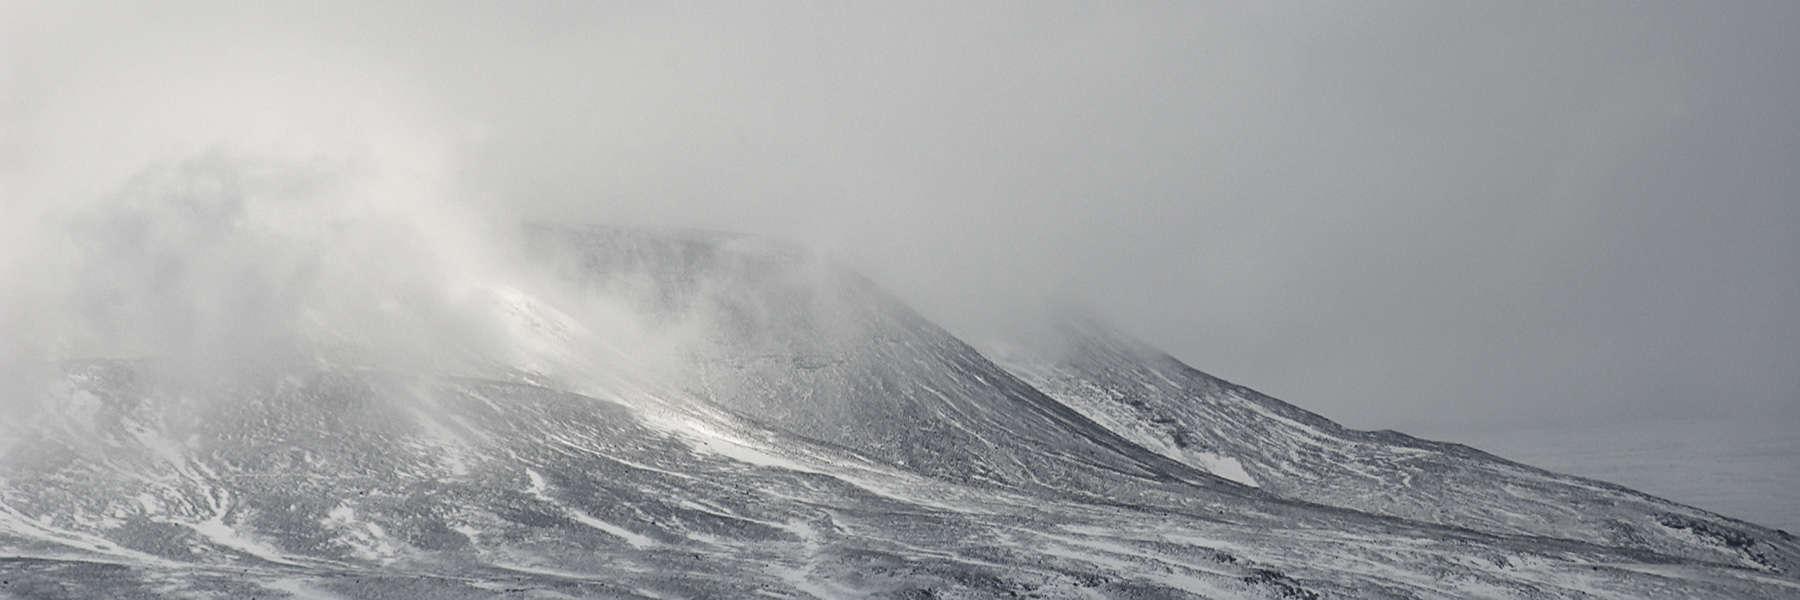 HAFRAFELL, Iceland